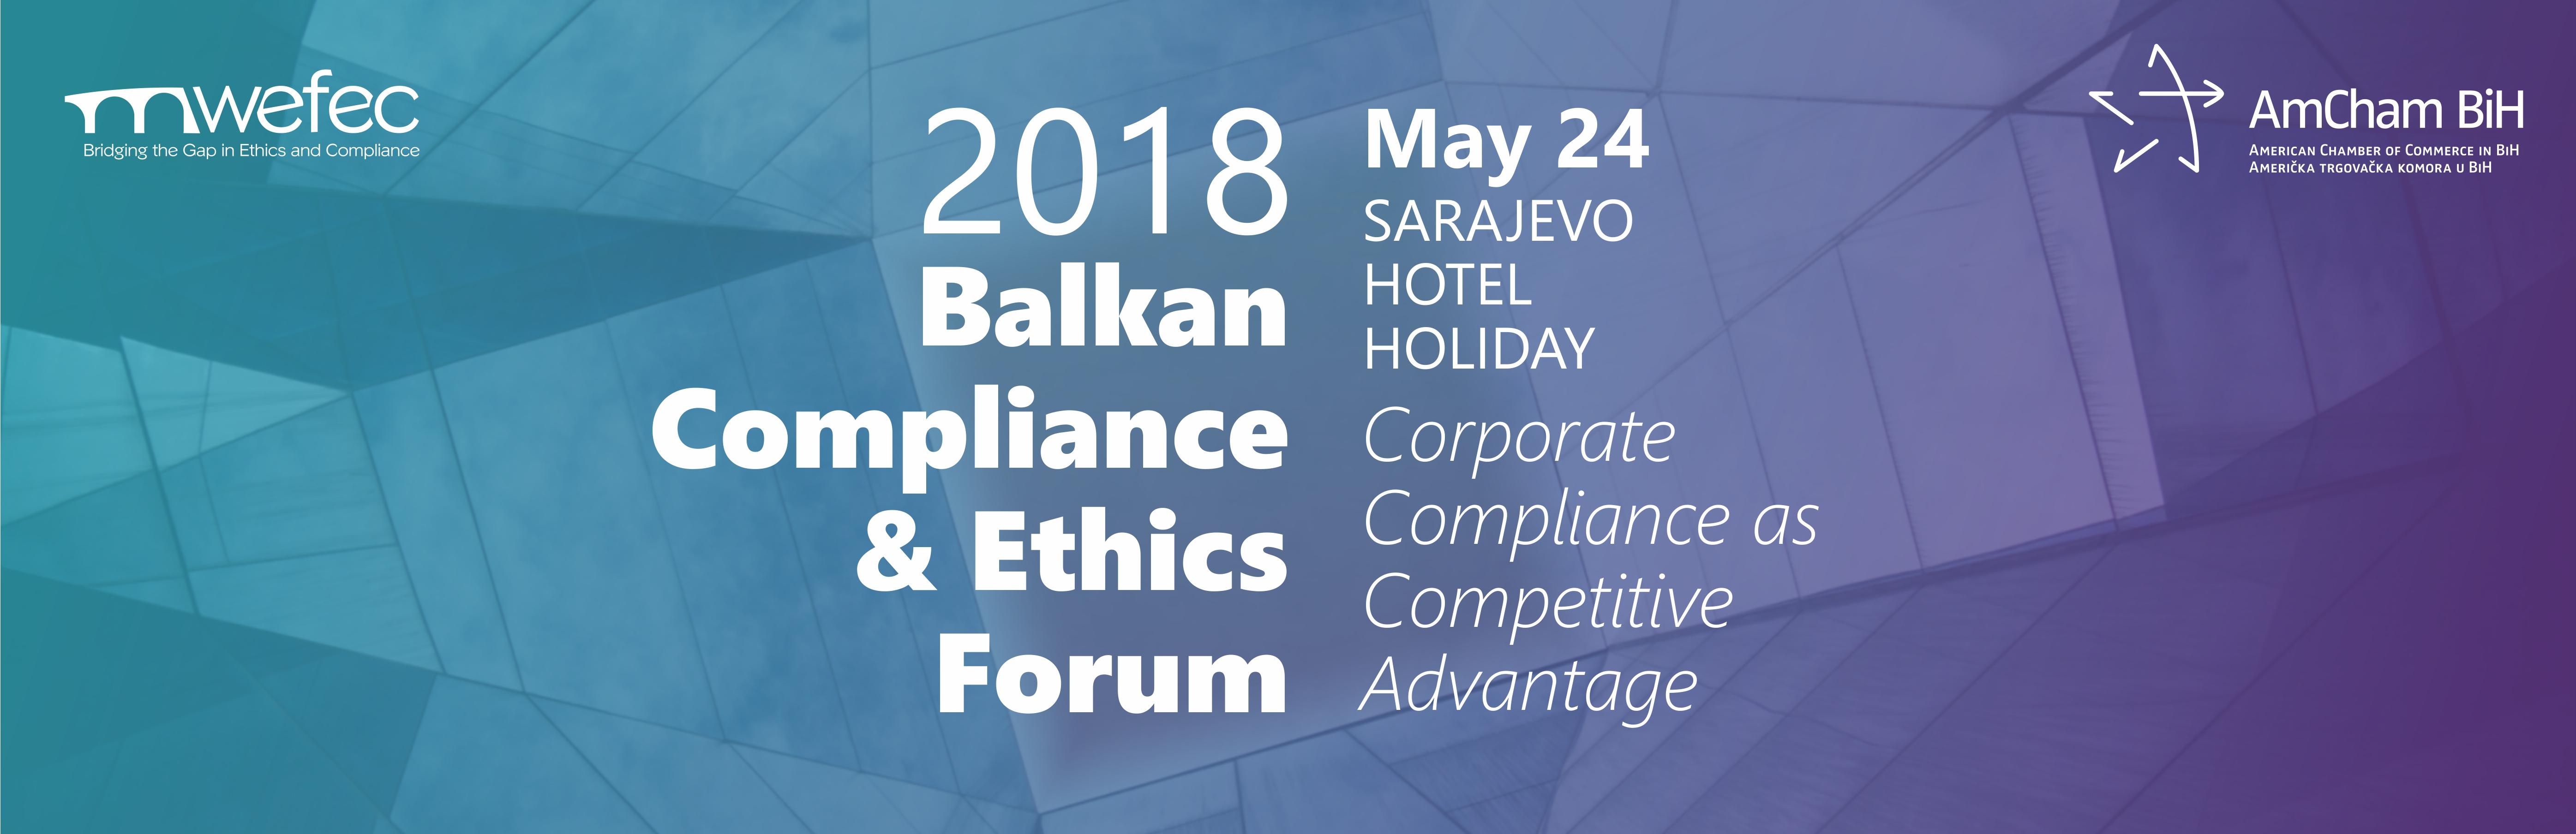 Balkan Compliance and Ethics Forum 2018